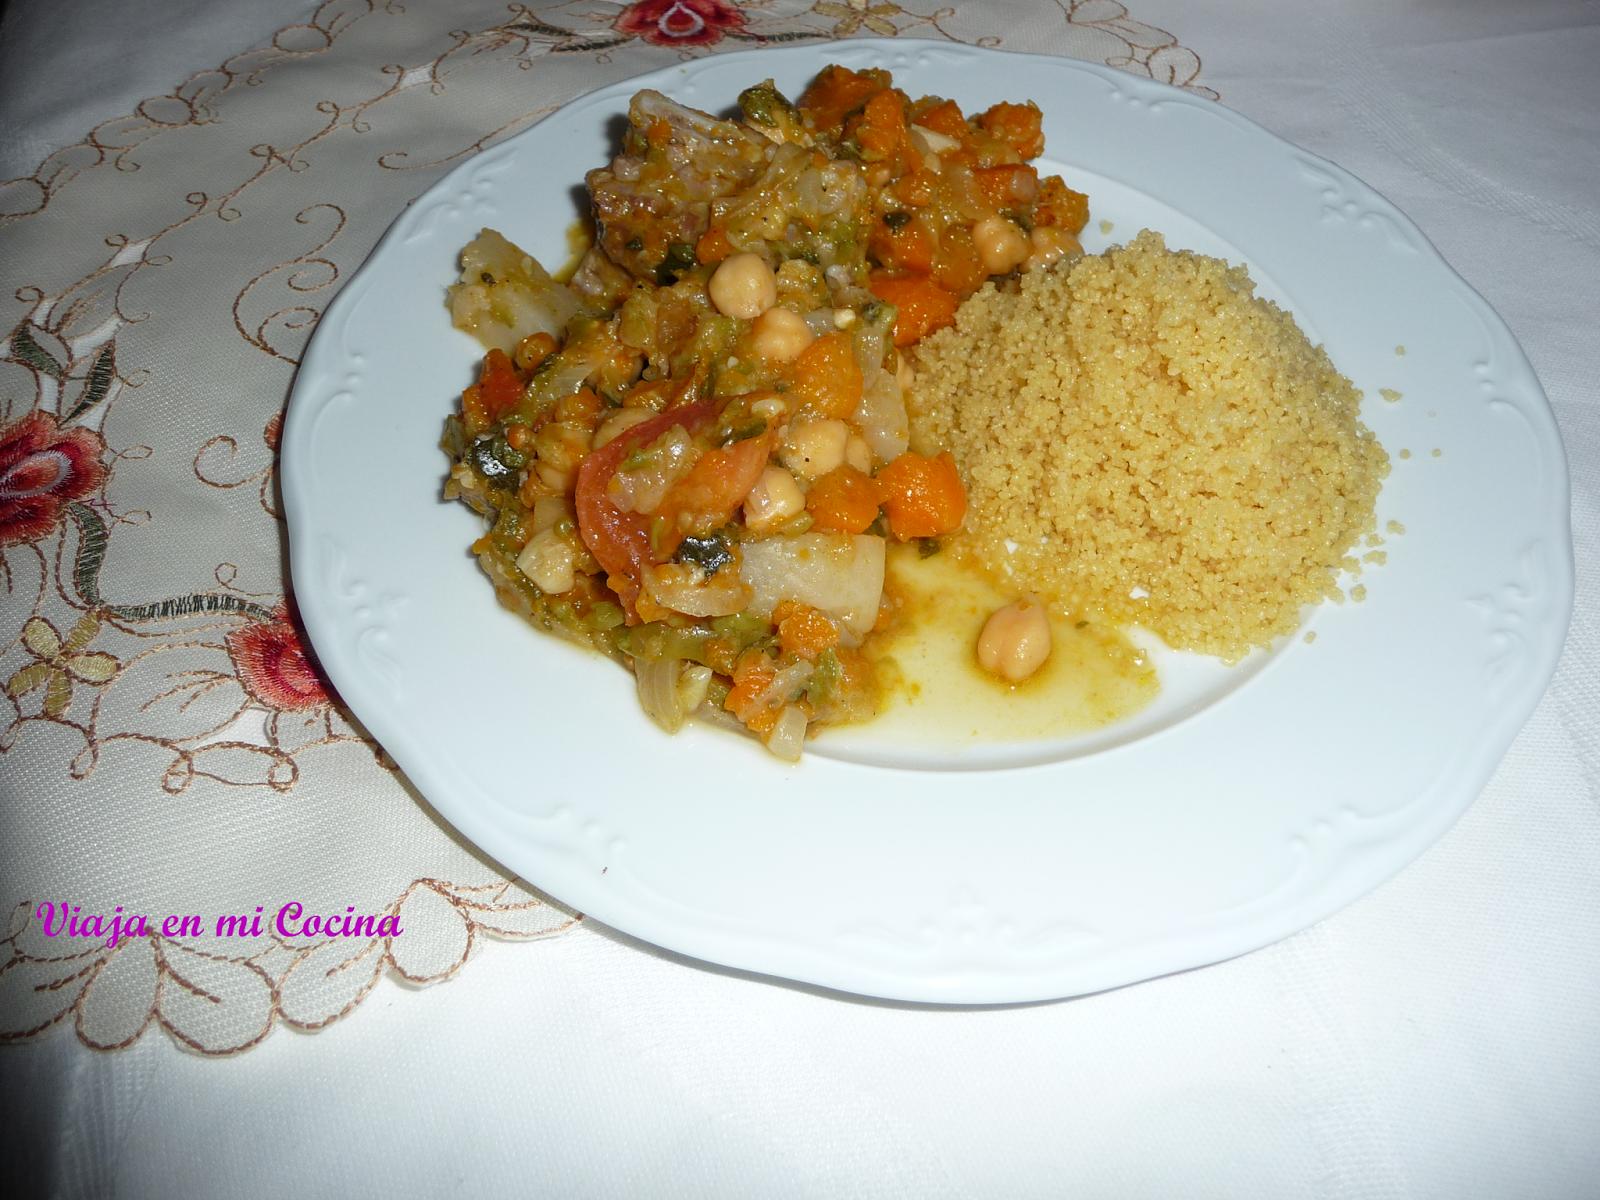 cuscús argelino